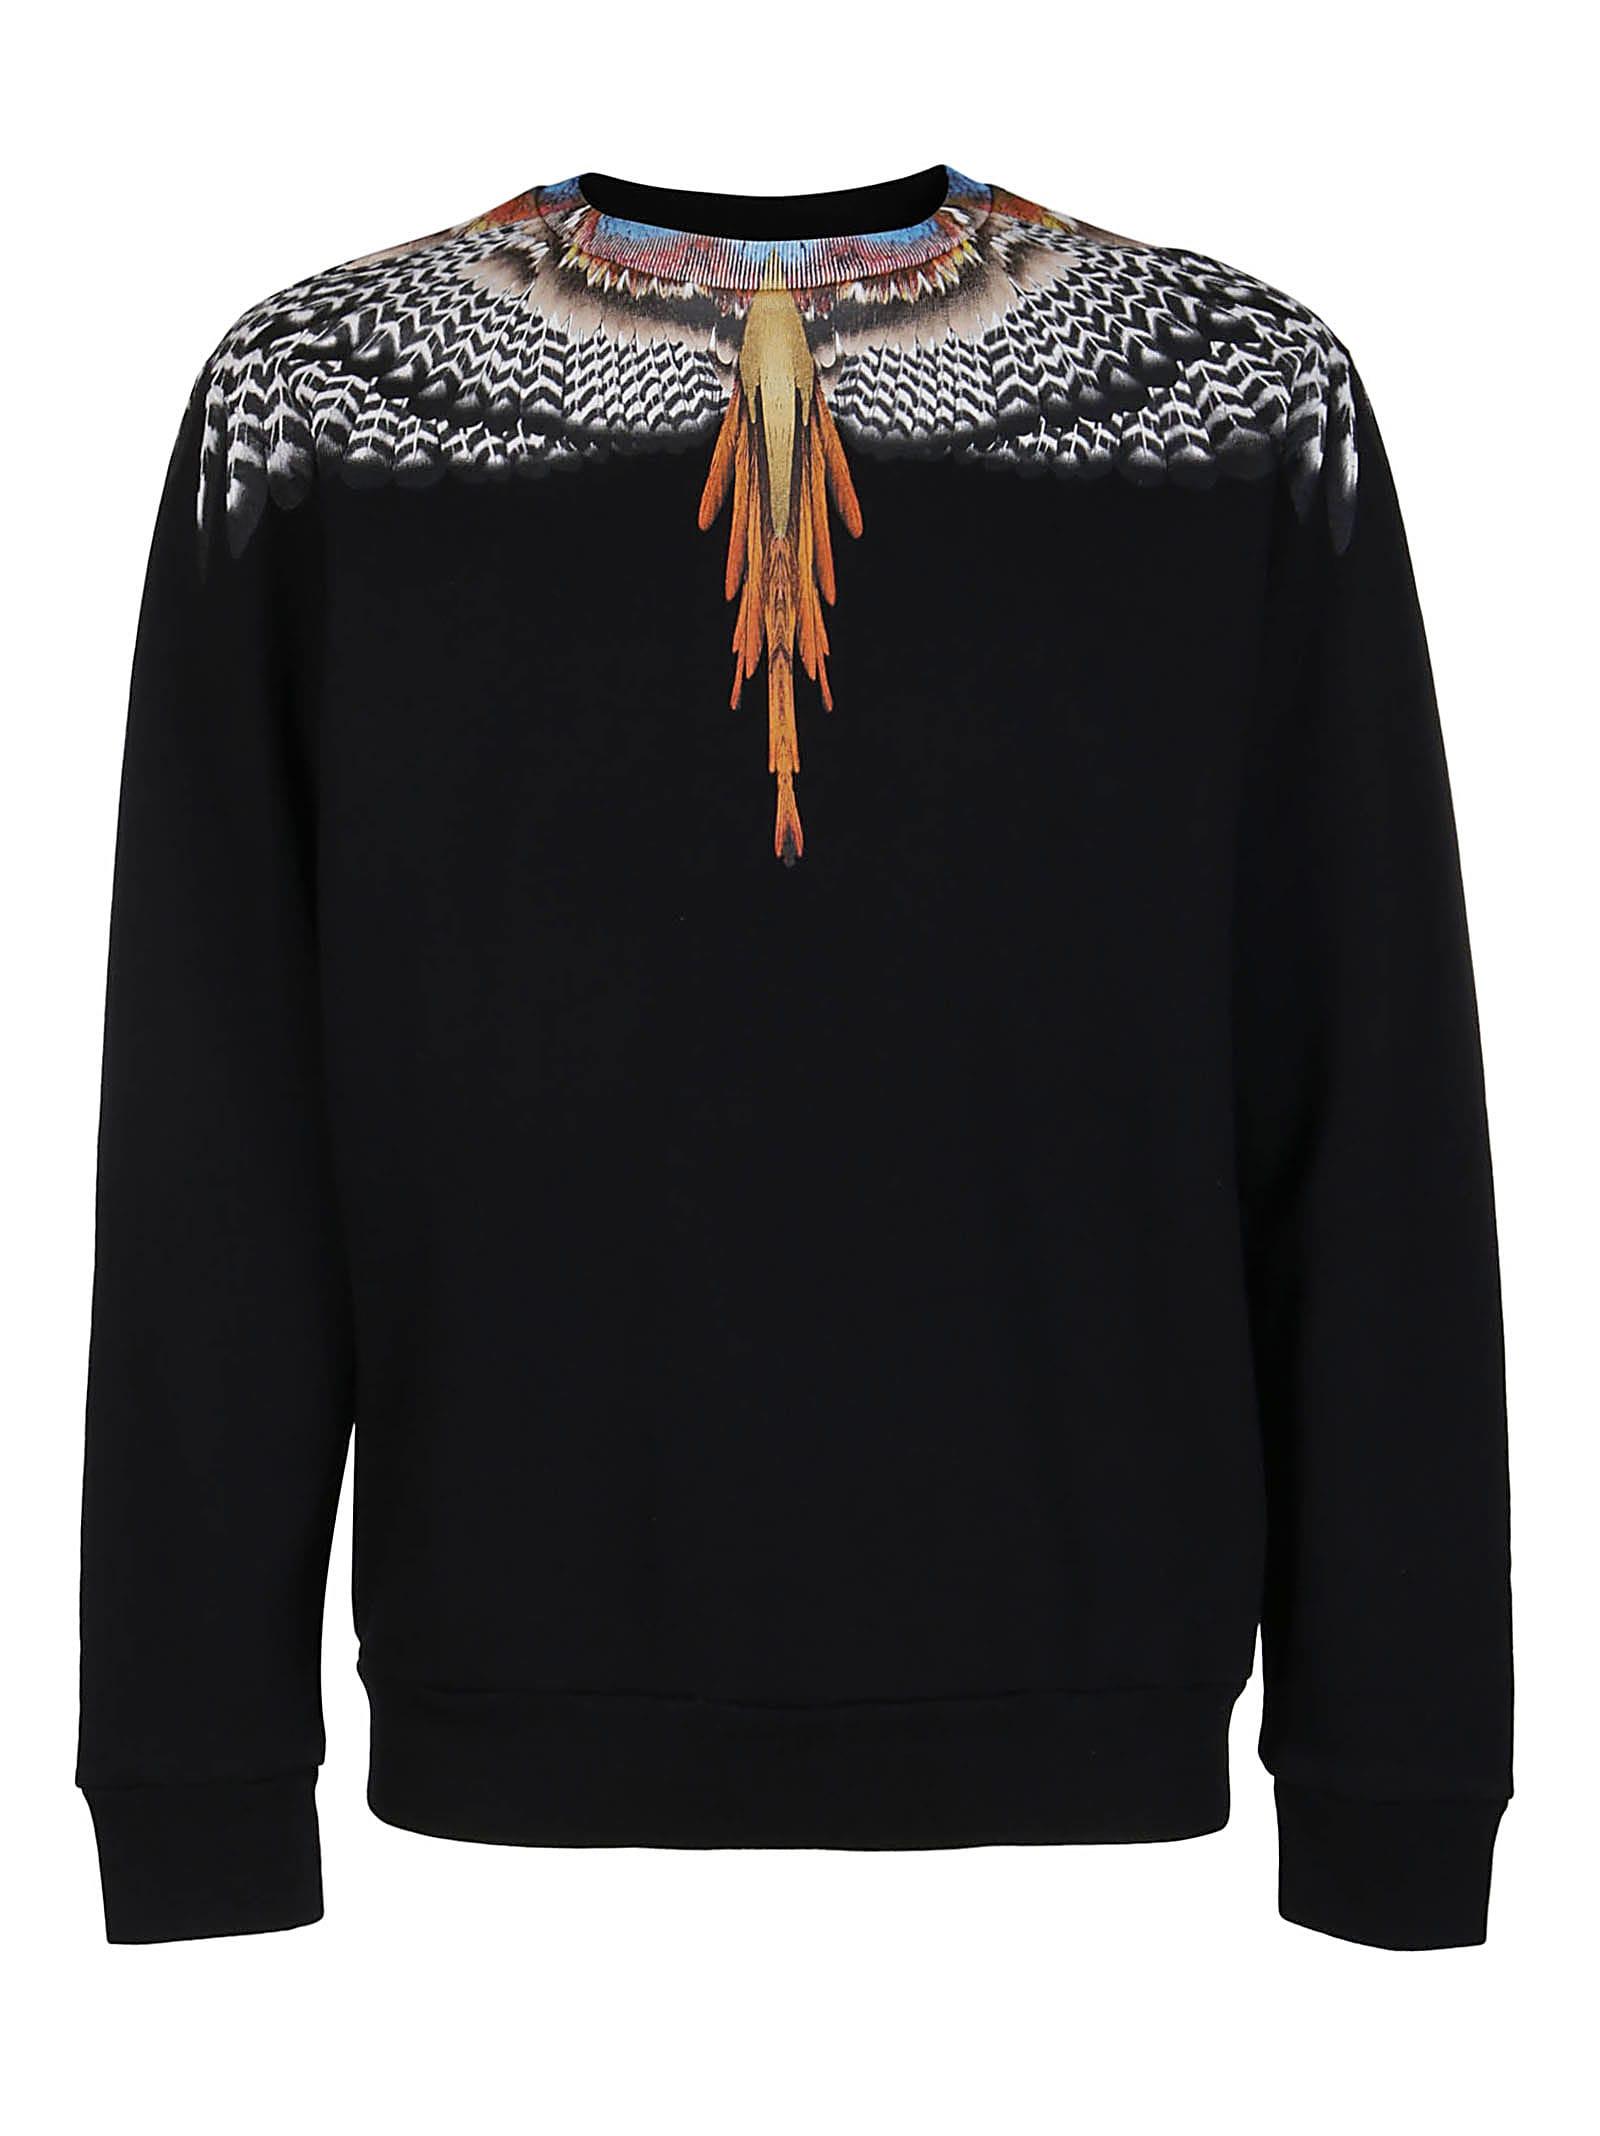 Marcelo Burlon County Of Milan Cottons BLACK COTTON WINGS SWEATSHIRT